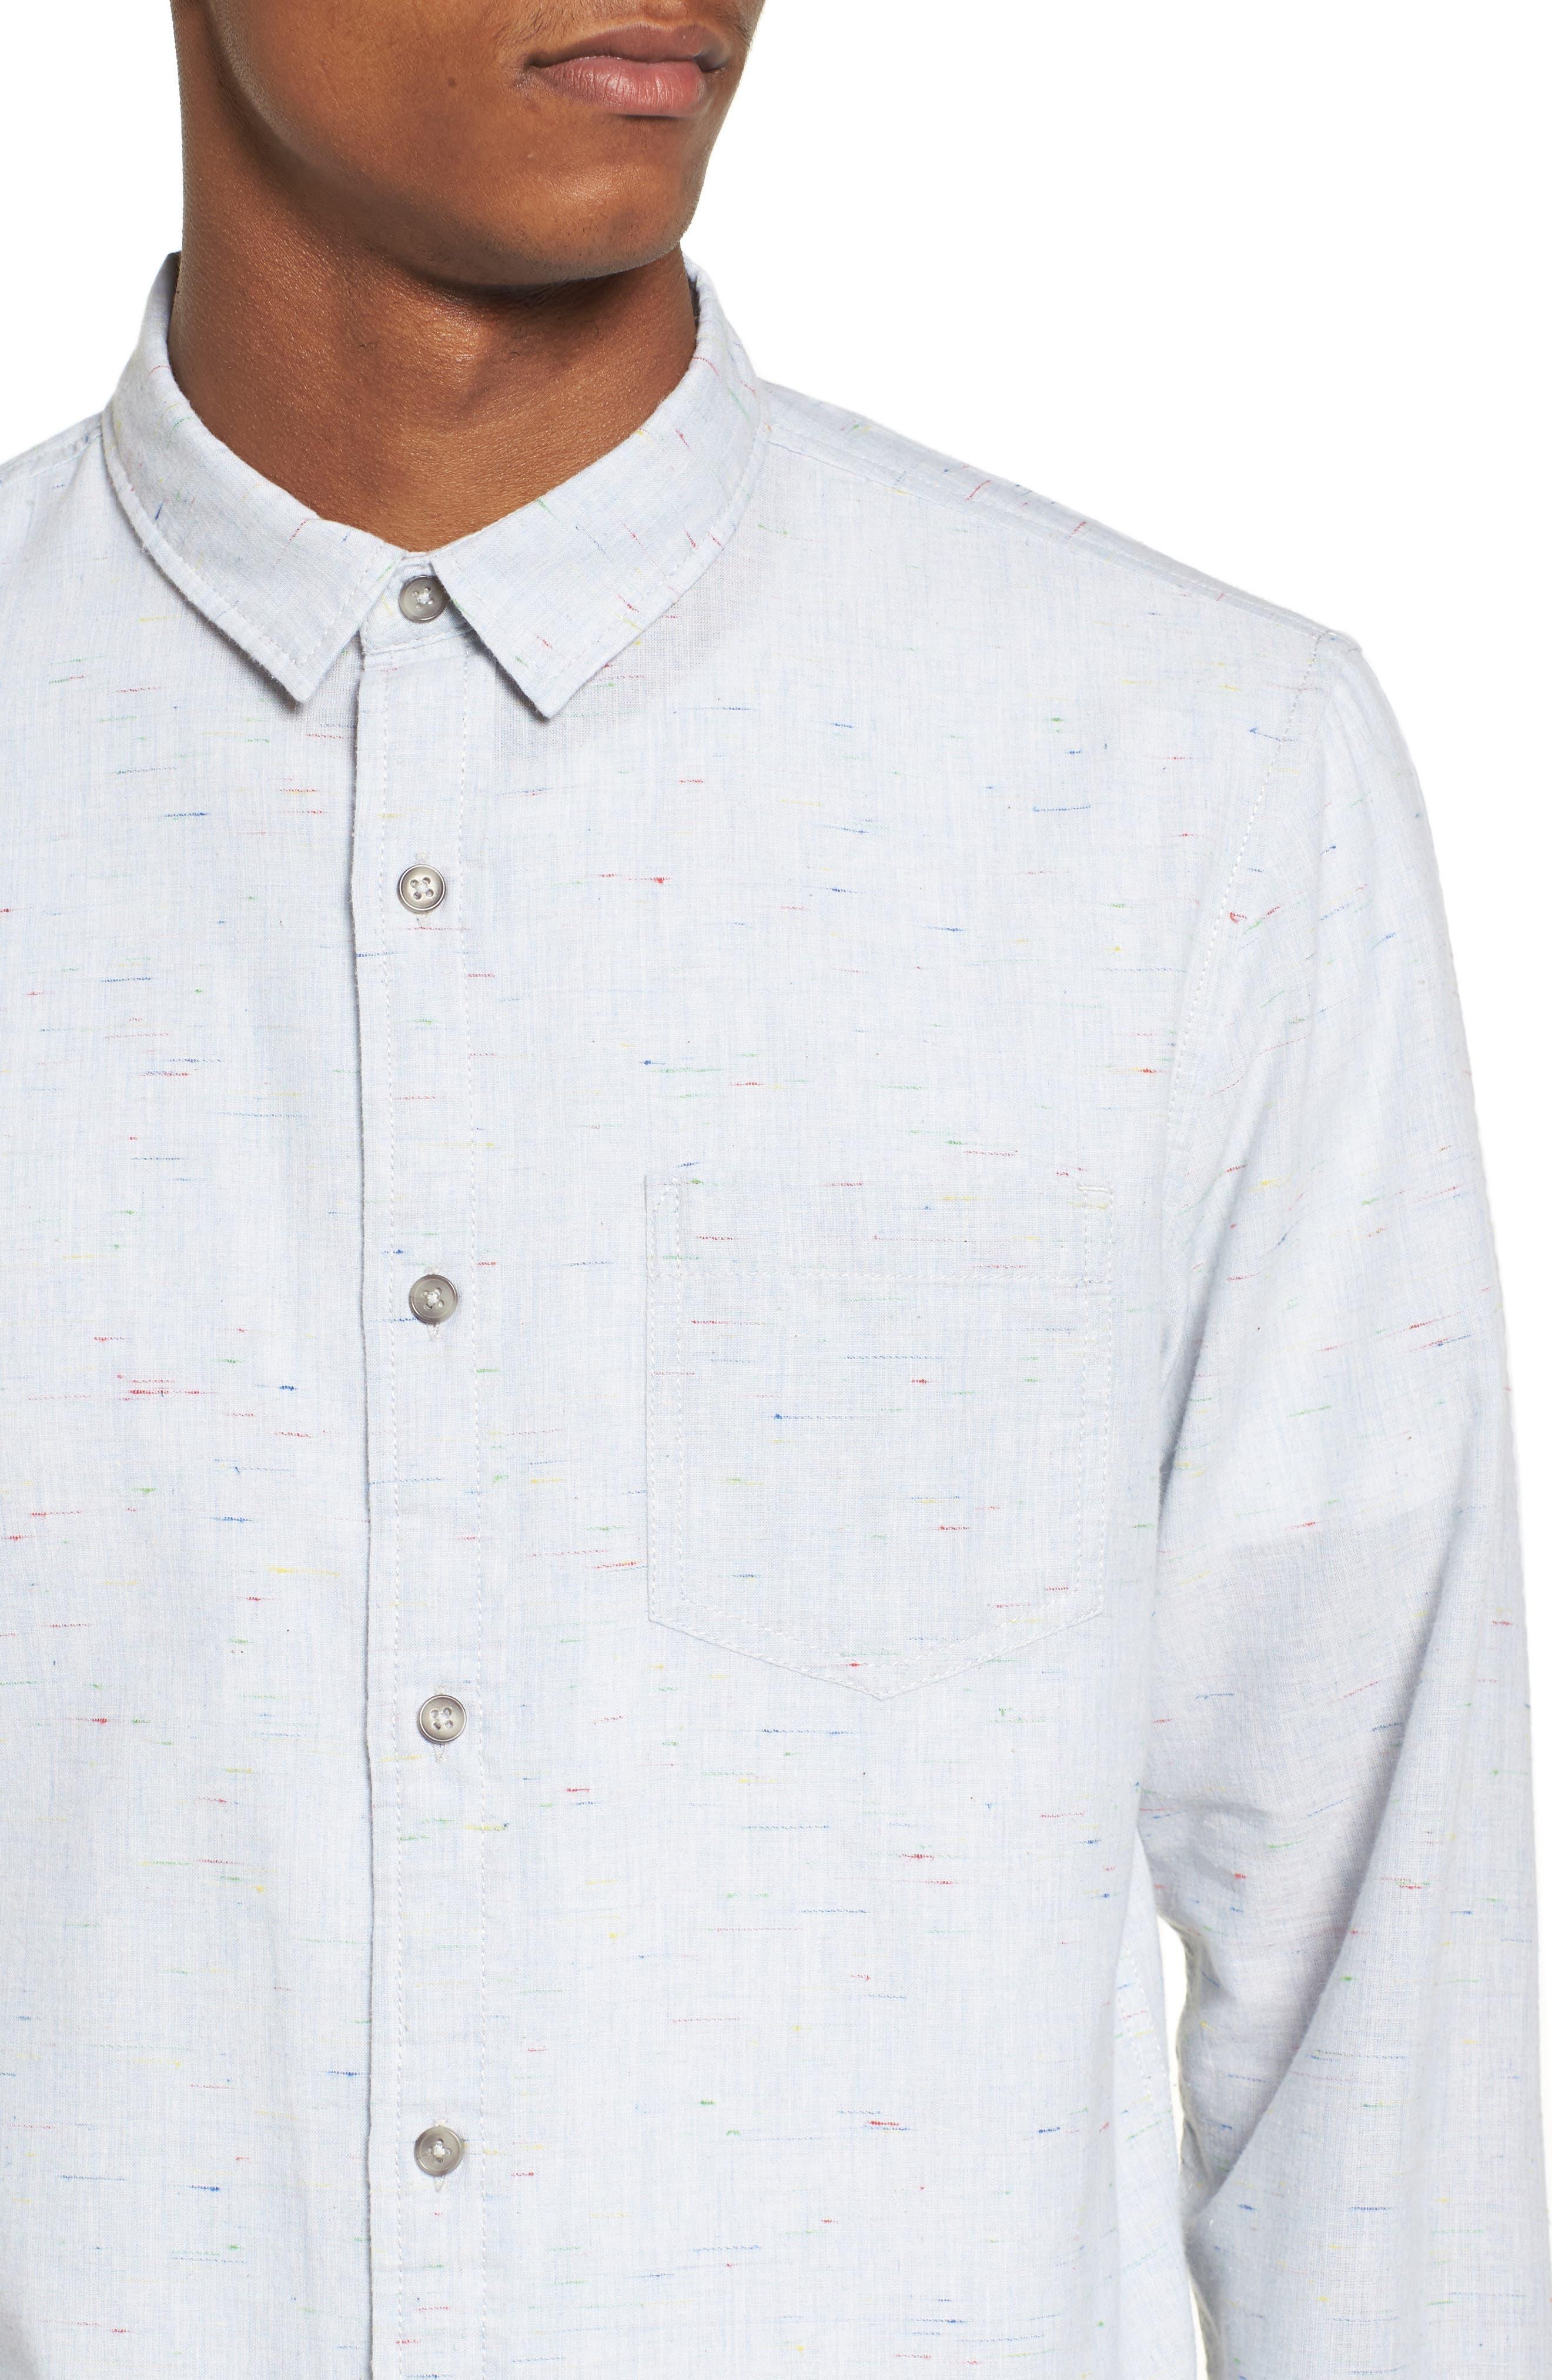 Long Sleeve Color Nep Shirt,                             Alternate thumbnail 4, color,                             Blue Chambray Multi Nep